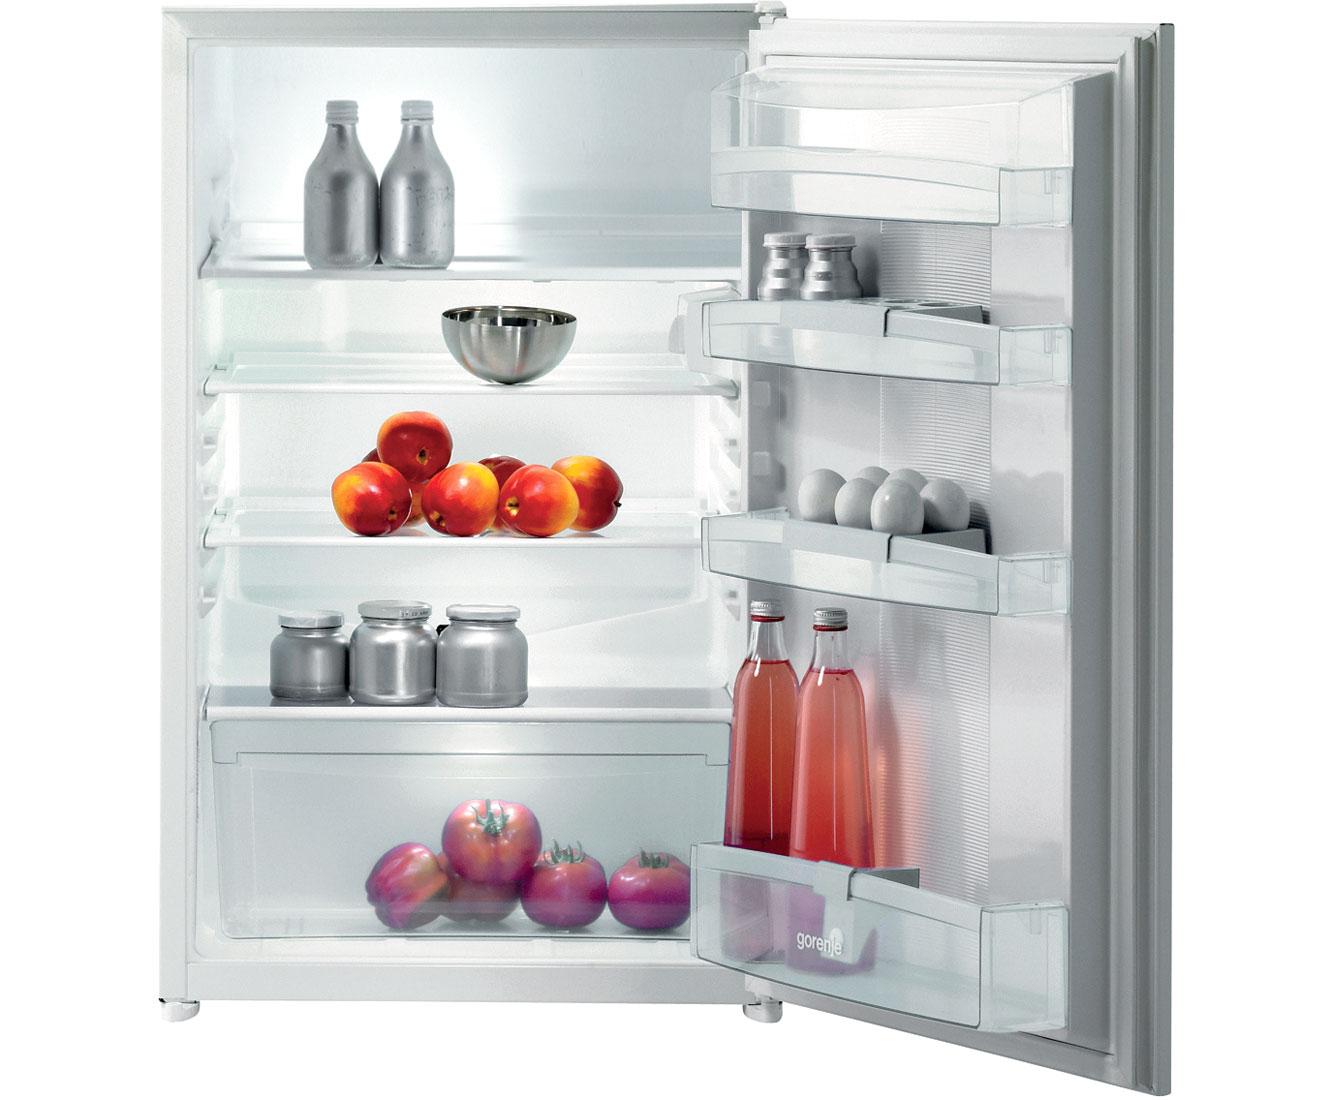 Amica Kühlschrank Uvks 16149 : Rabatt preisvergleich.de haushalt u003e großgeräte u003e kühlschränke